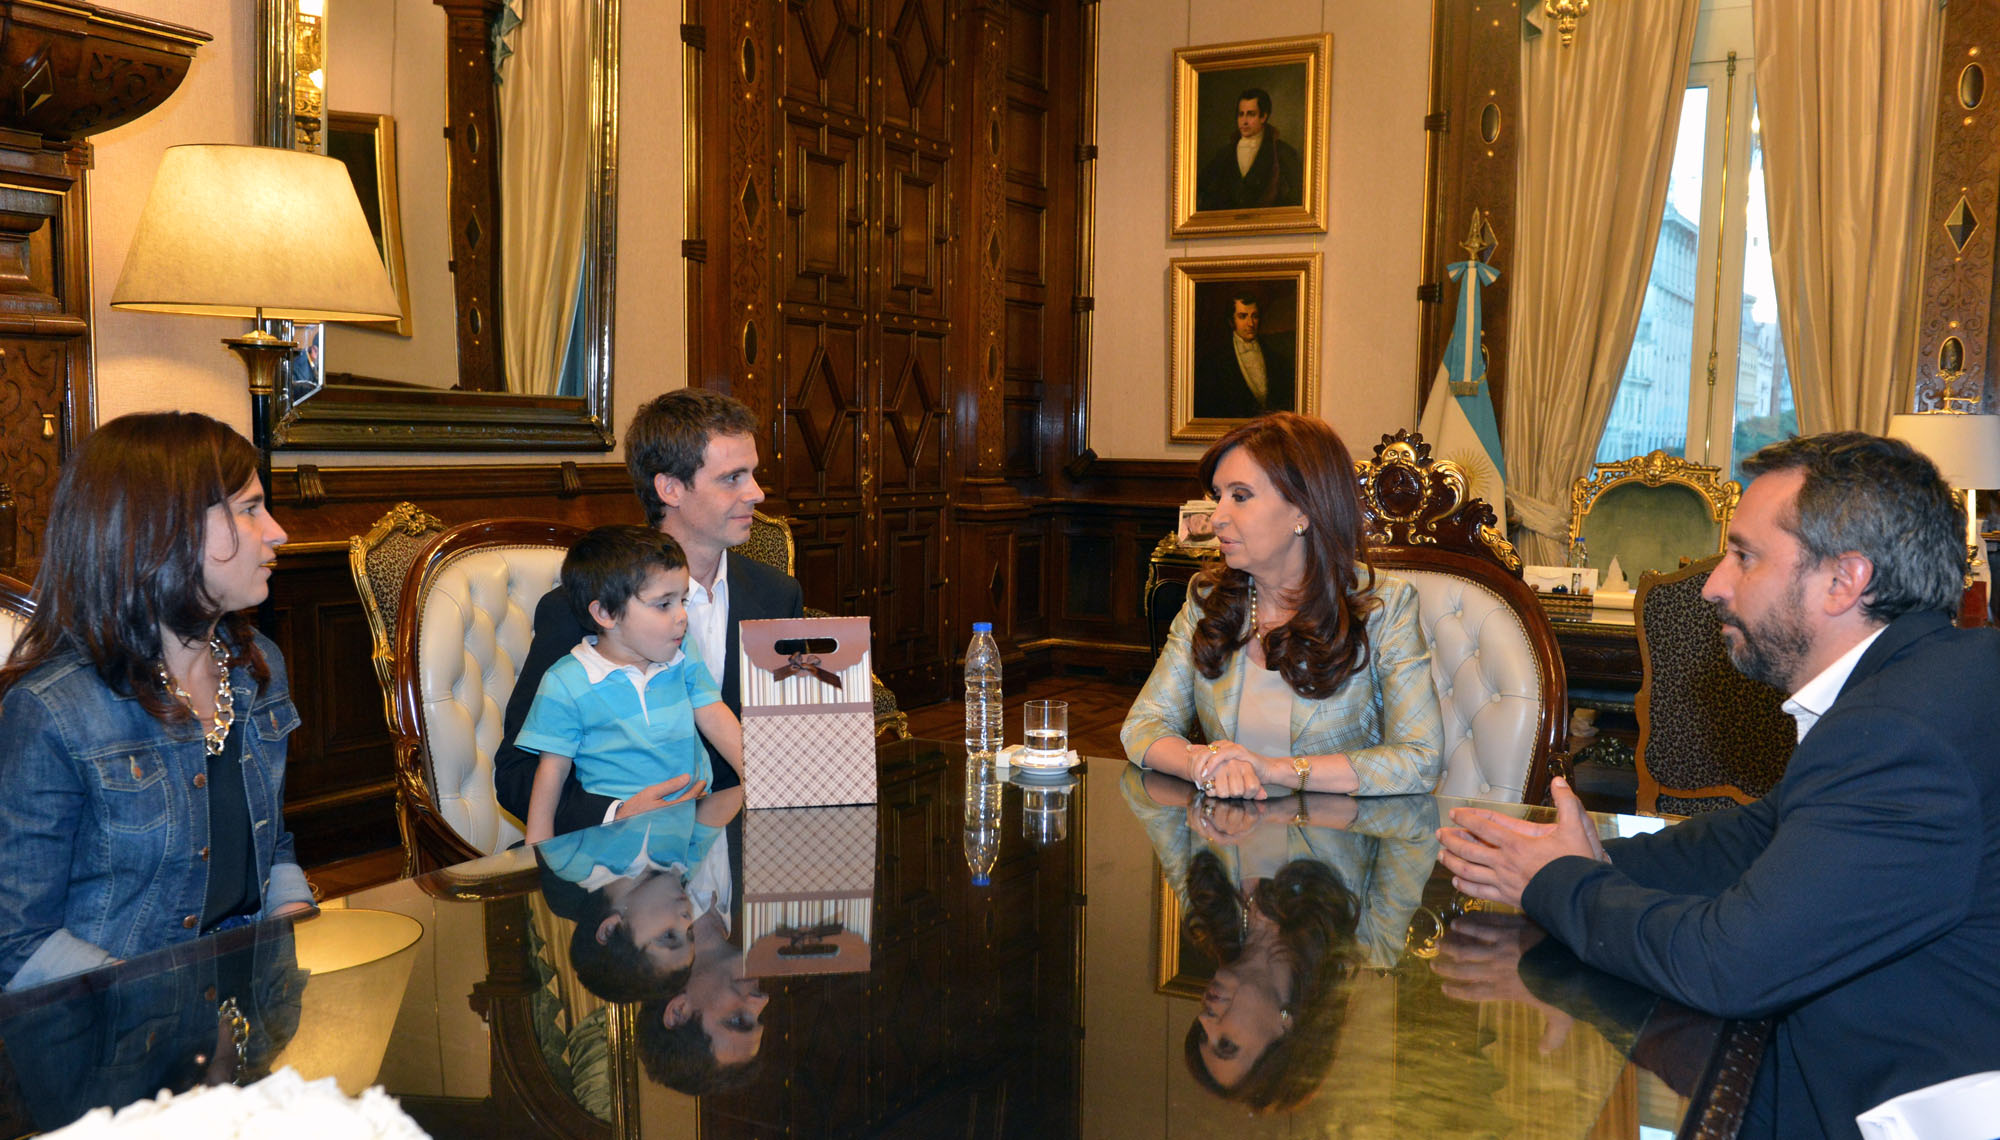 Cristina recibió a Jorge Castro Rubel, el nieto recuperado 116